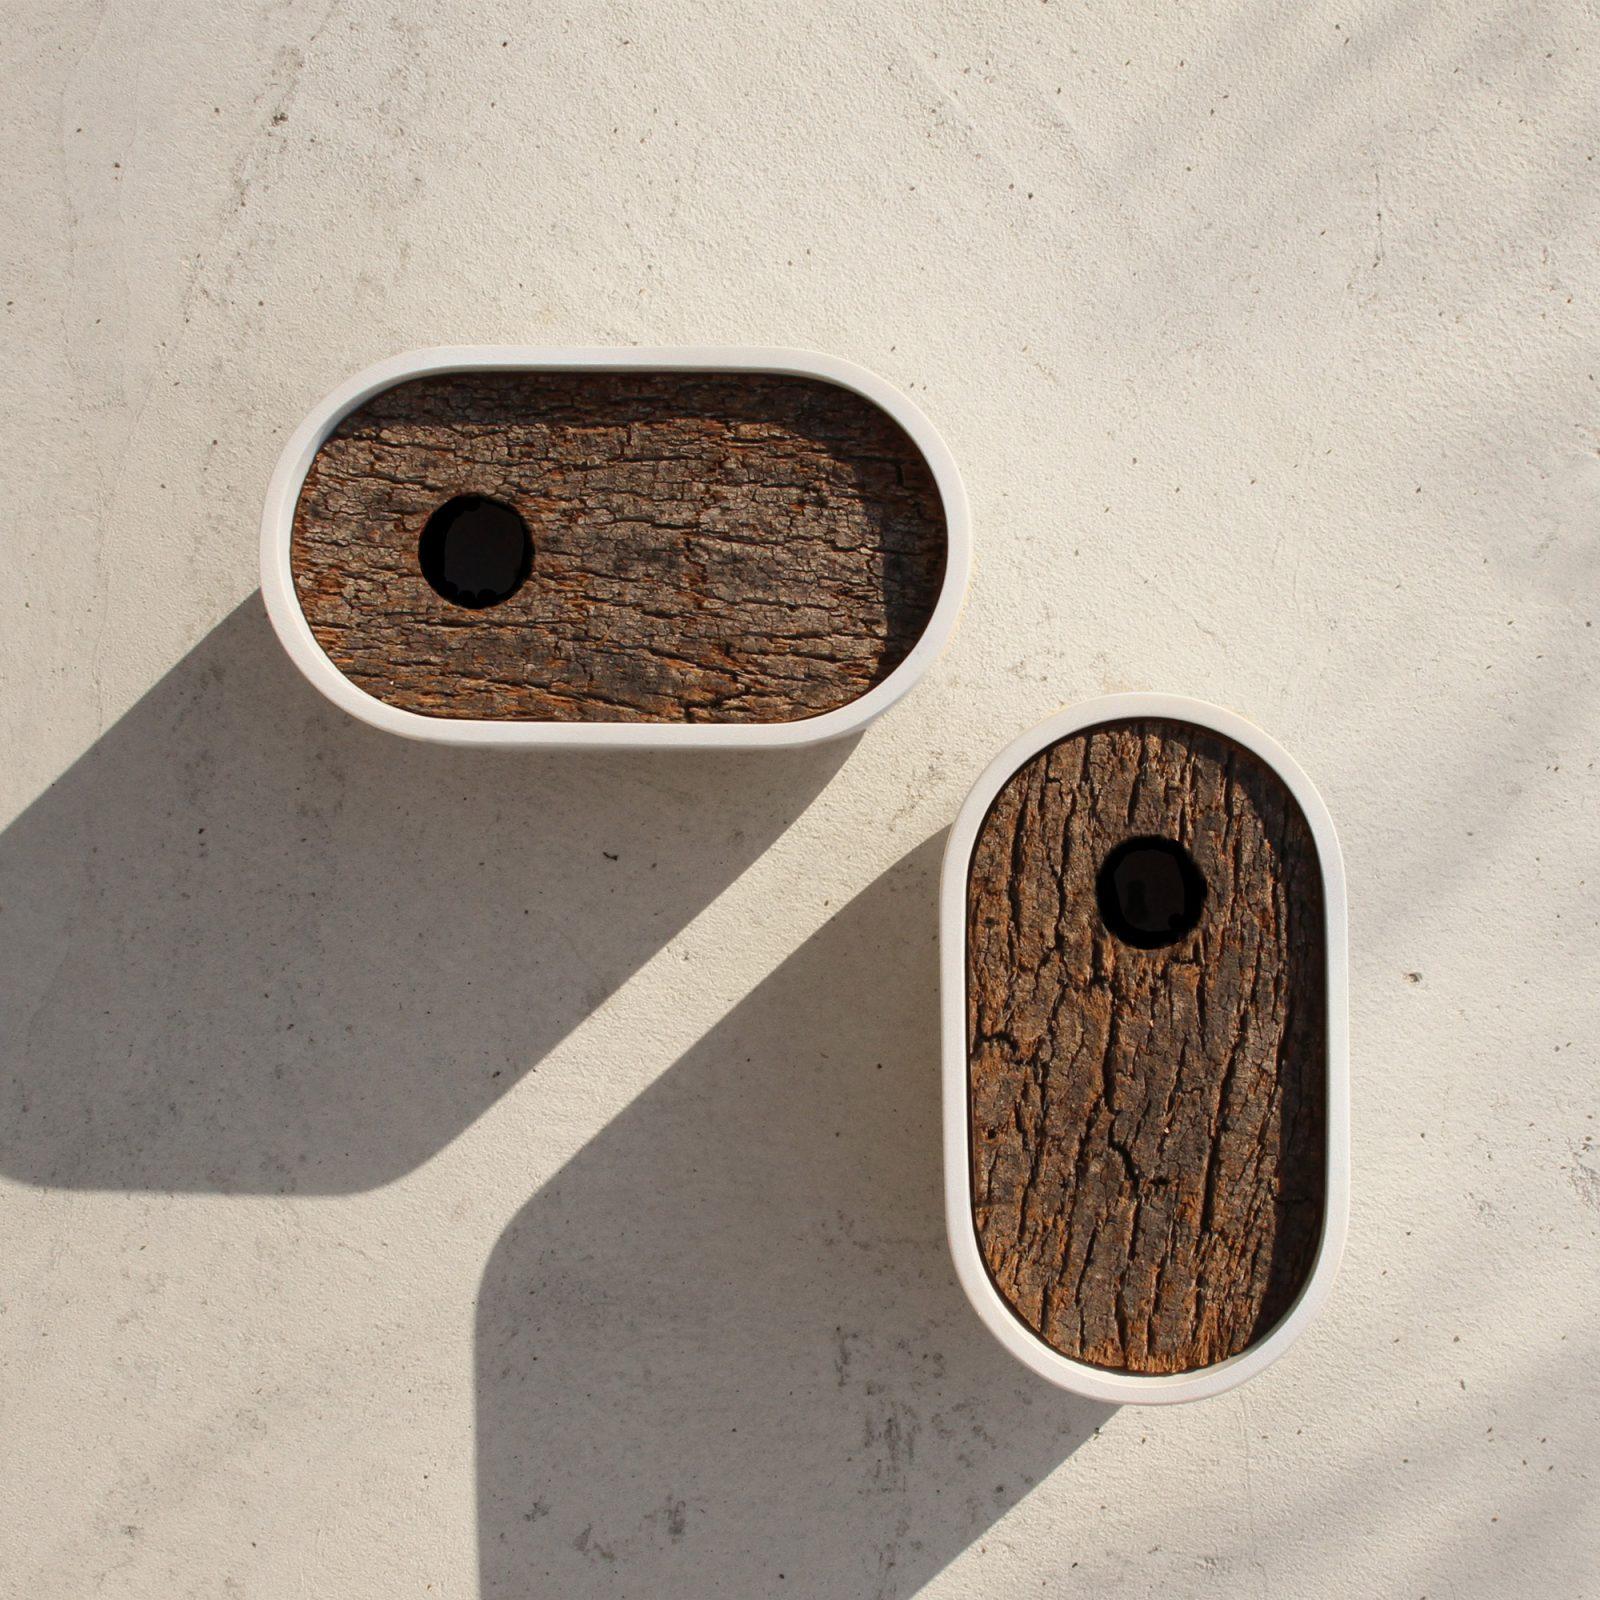 hole-inn-concrete-cork-birdhouse-2